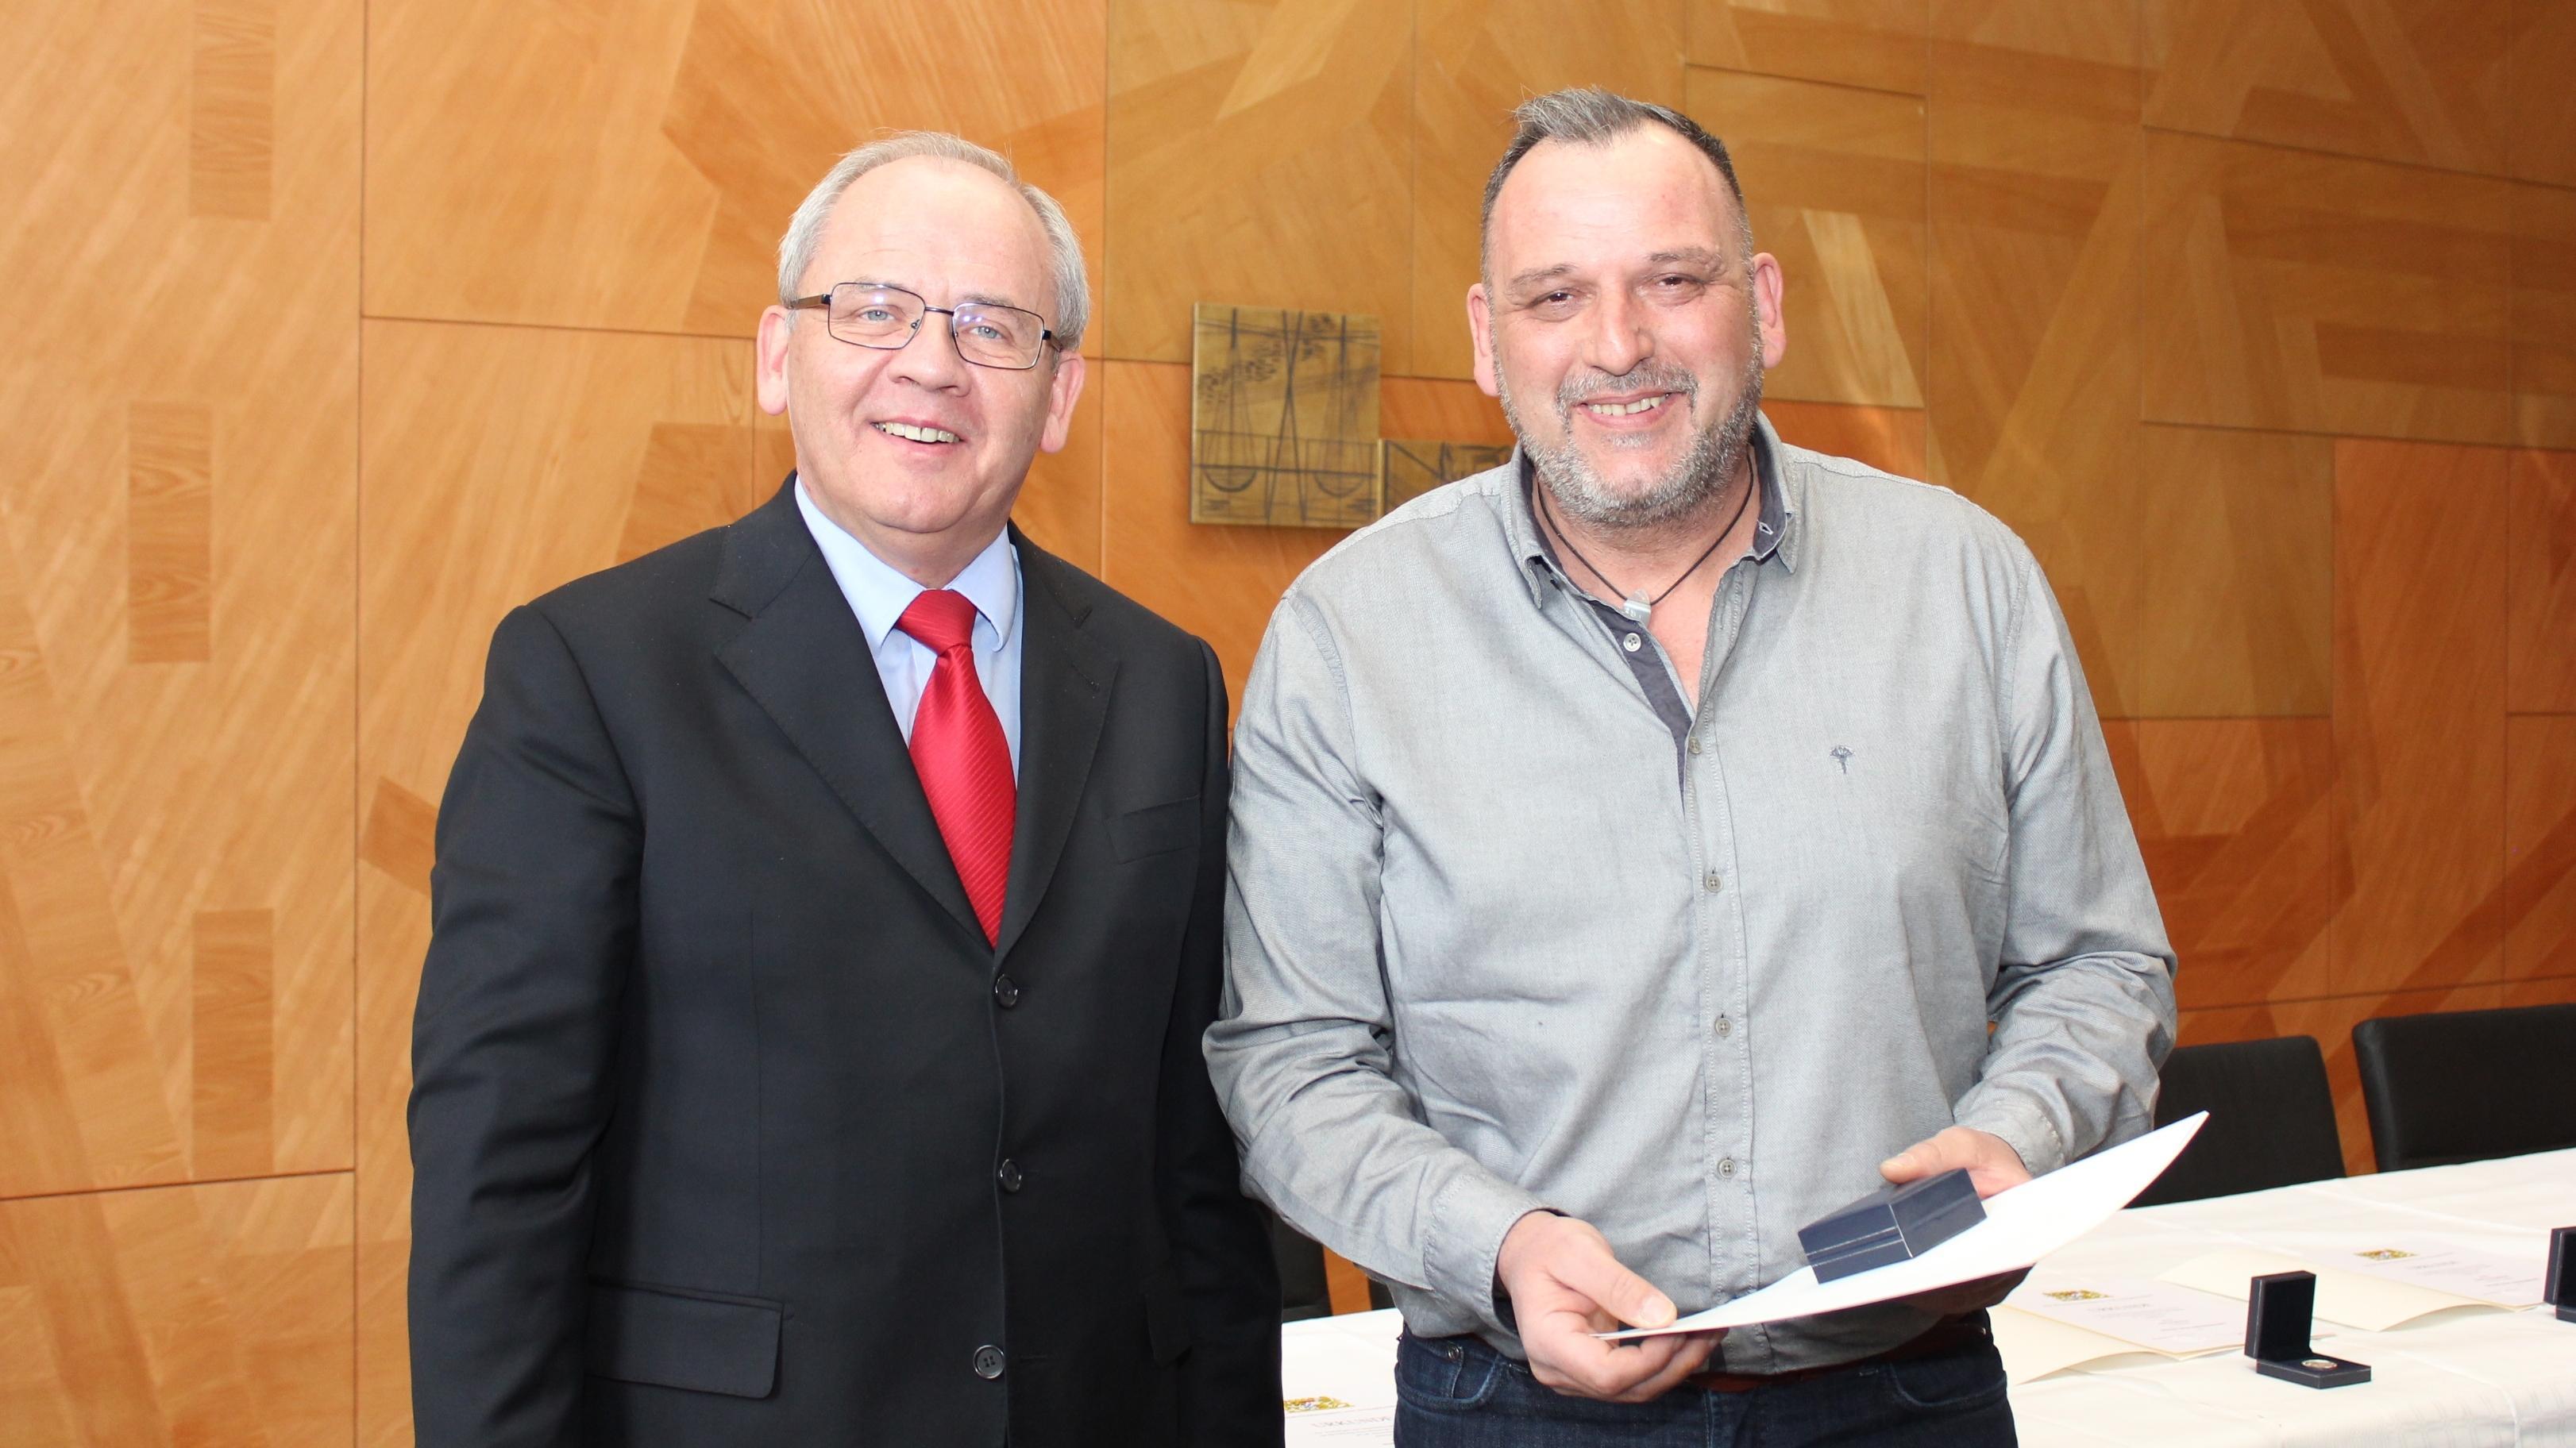 Dr. Eugen Ehmann und Frank Keimig (v.l.)